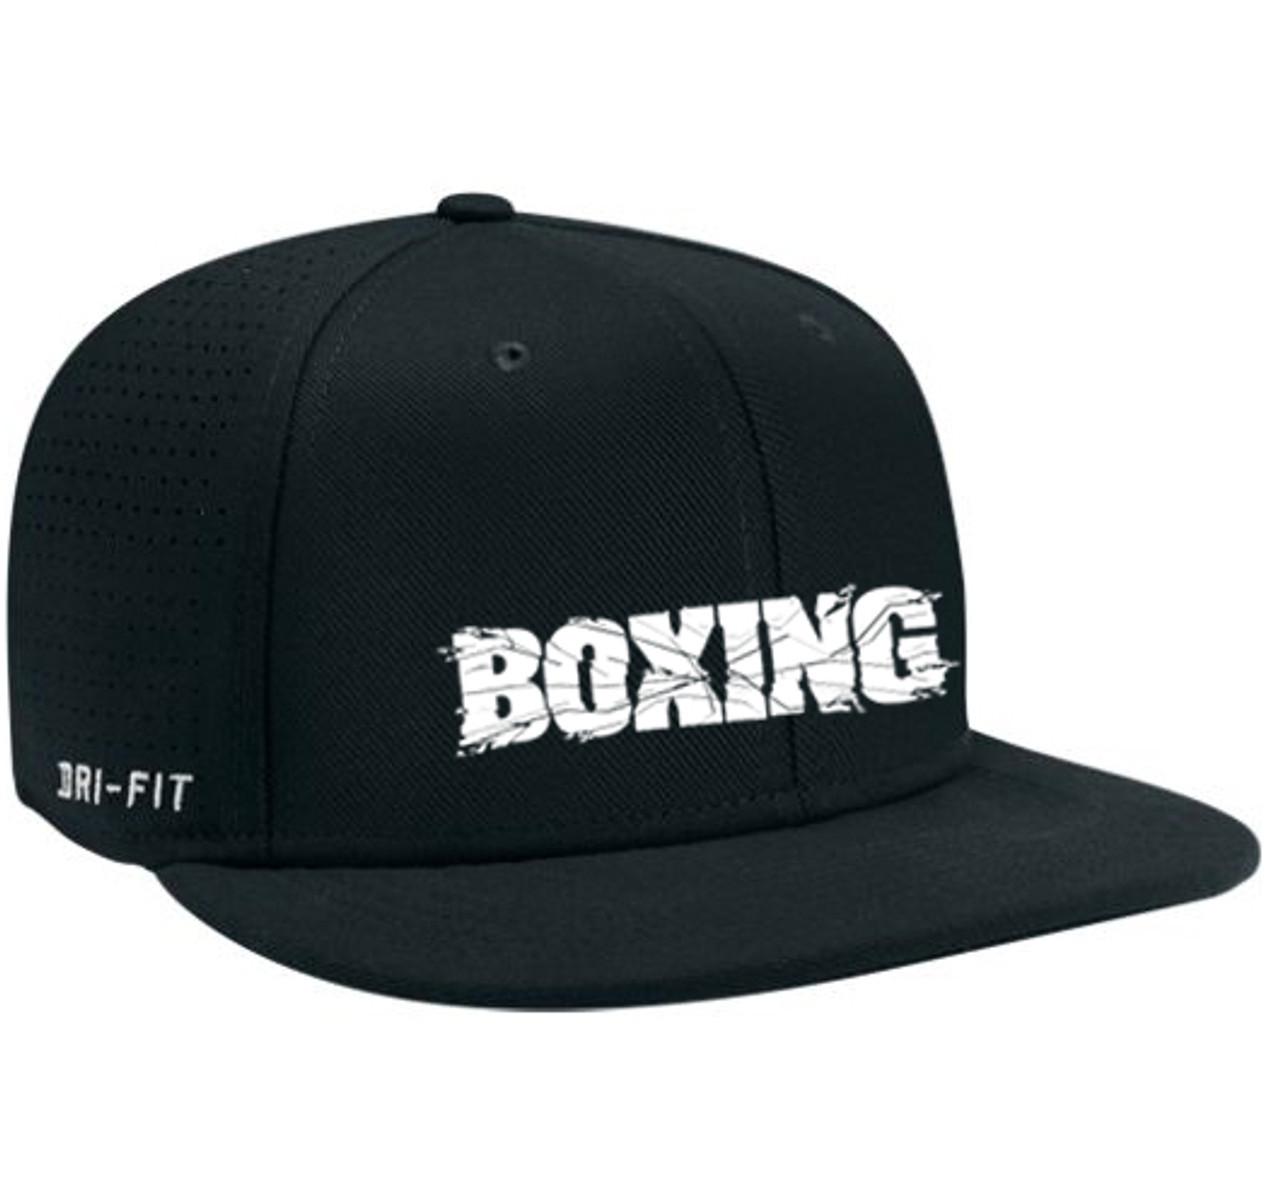 vapor boxing  90846.1445967348.jpg c 2 imbypass on 6a376809b5e